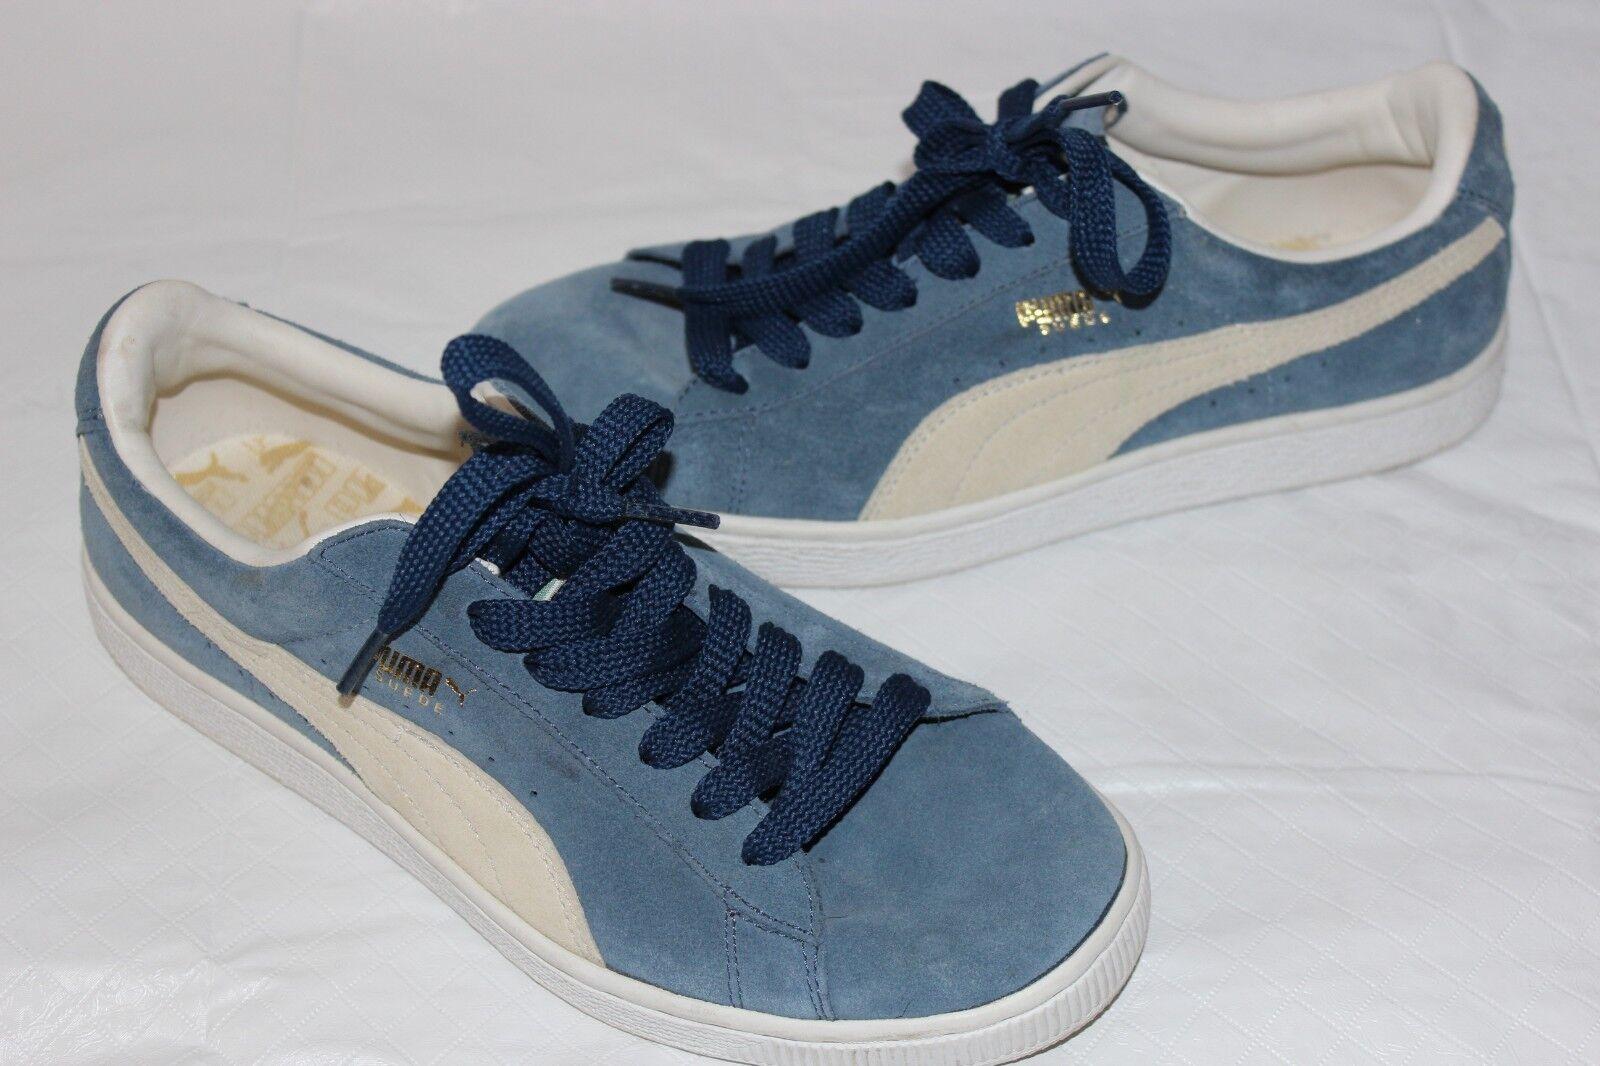 Puma Men's Classic bluee Fog Cream White Suede Sneaker SZ 7